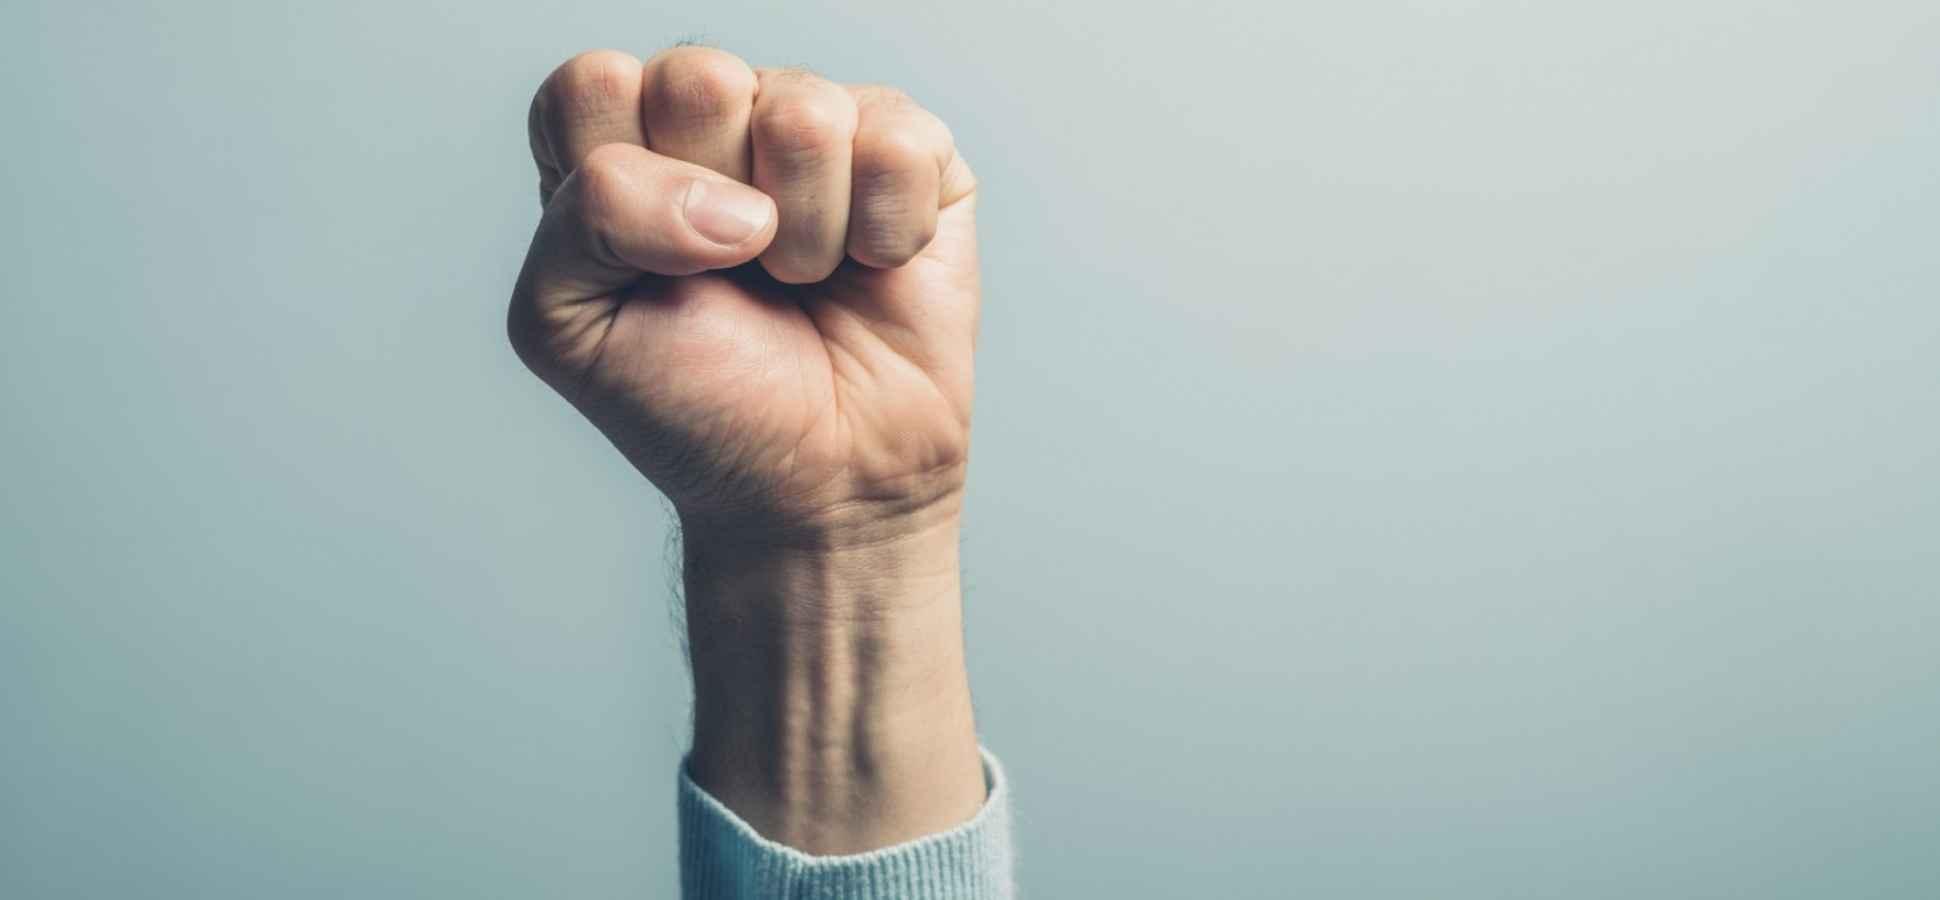 3 Body-Language Tricks That Make You Look Powerful